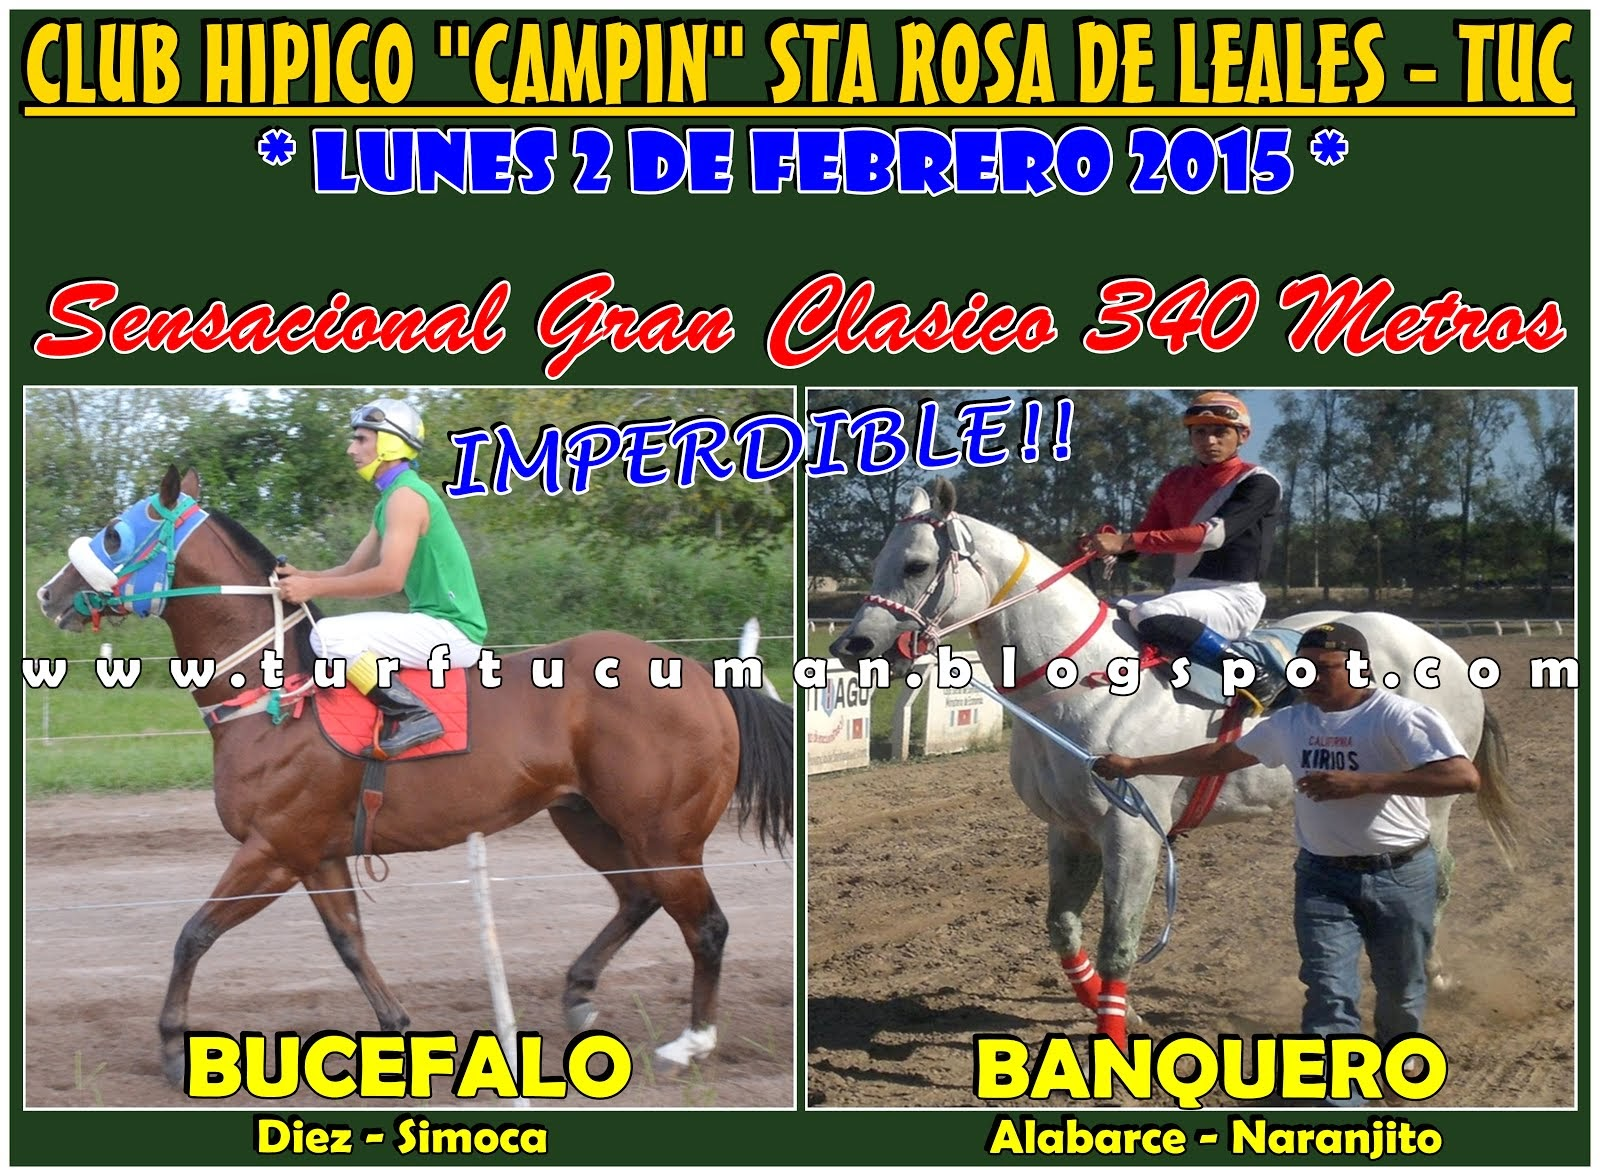 BUCEFALO VS BANQUERO